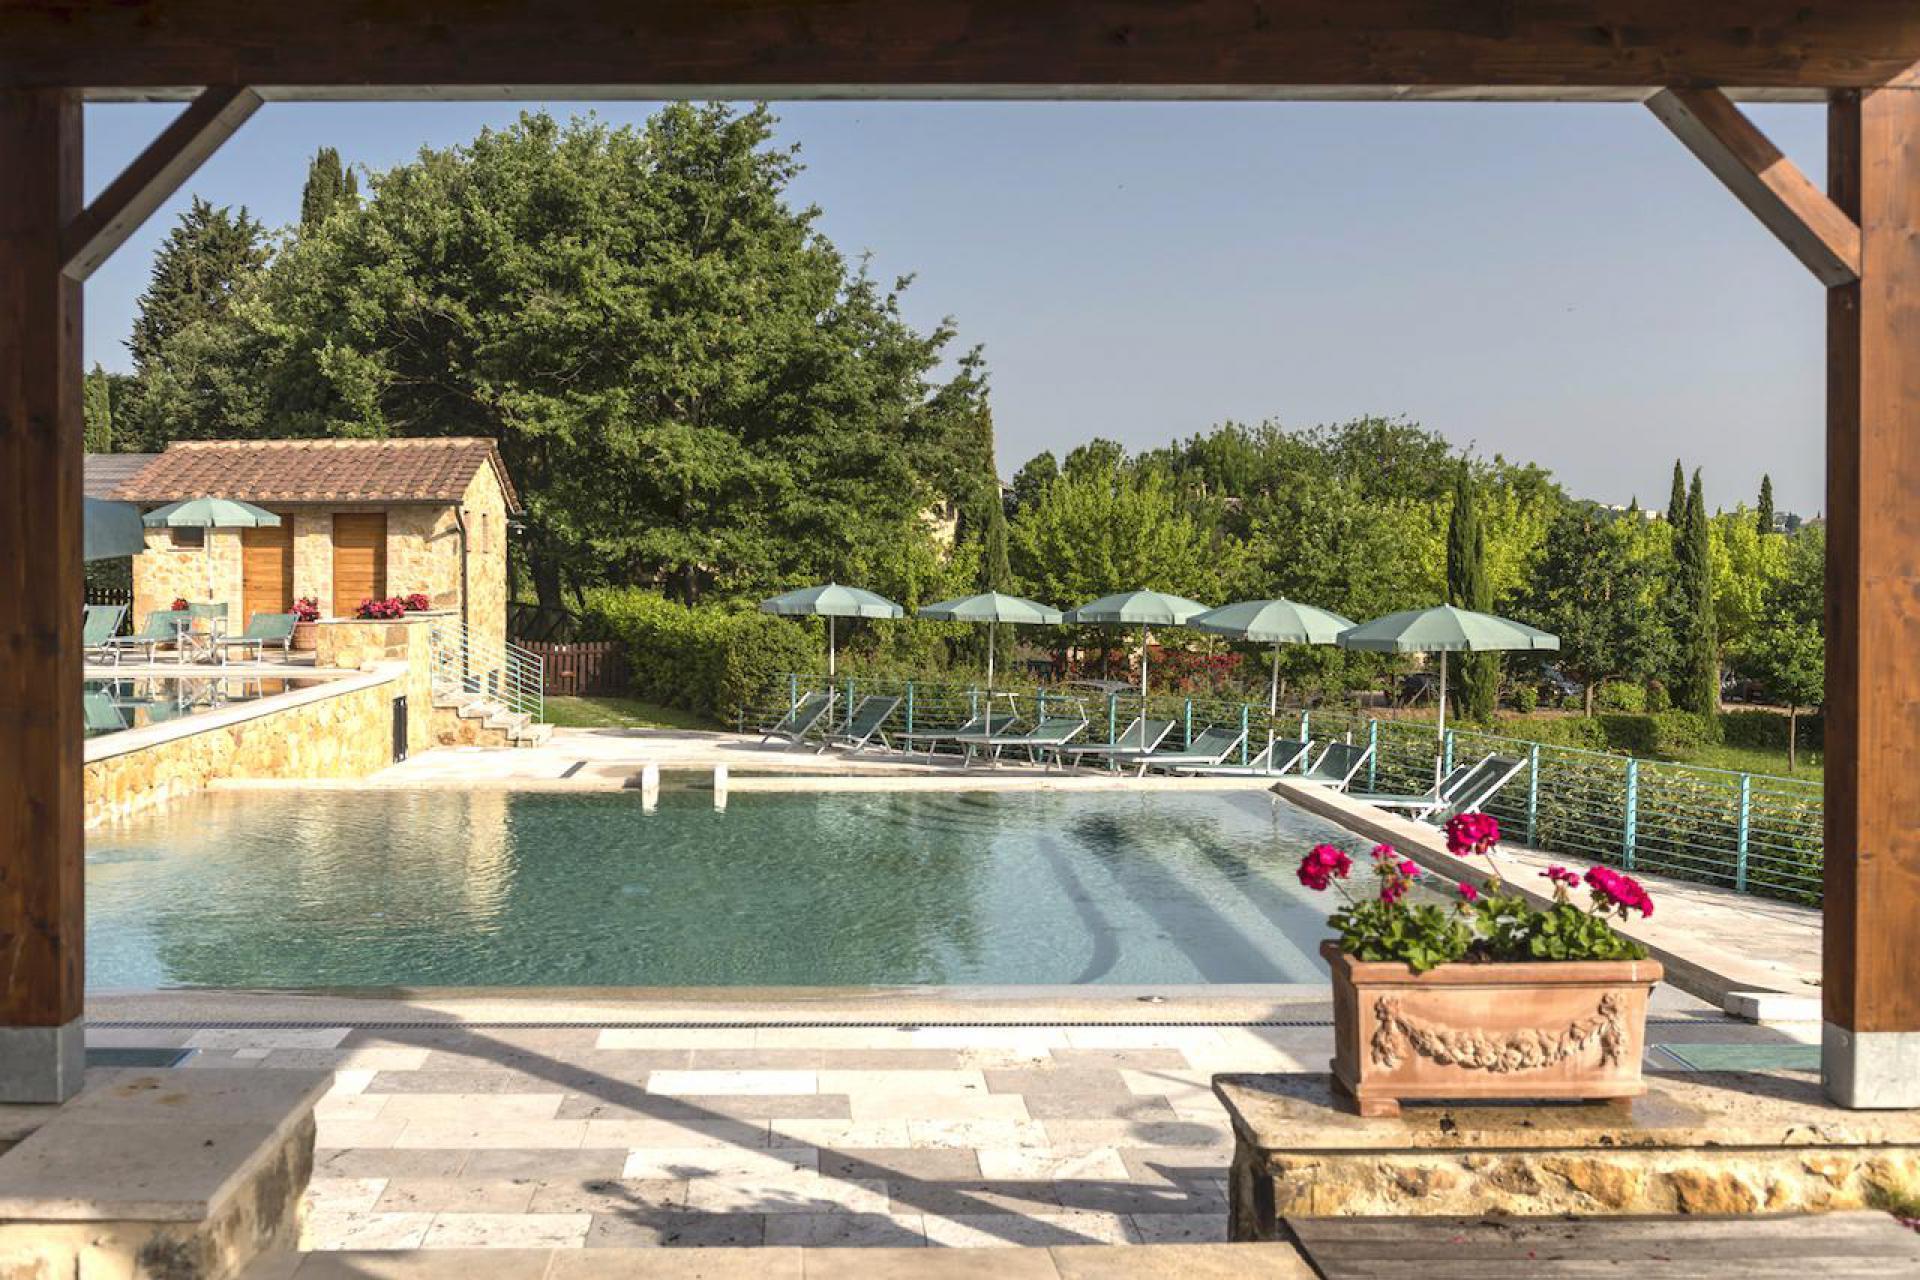 Agriturismo Toscane Agriturismo Country Resort Toscane met mooi zwembad en Restaurant